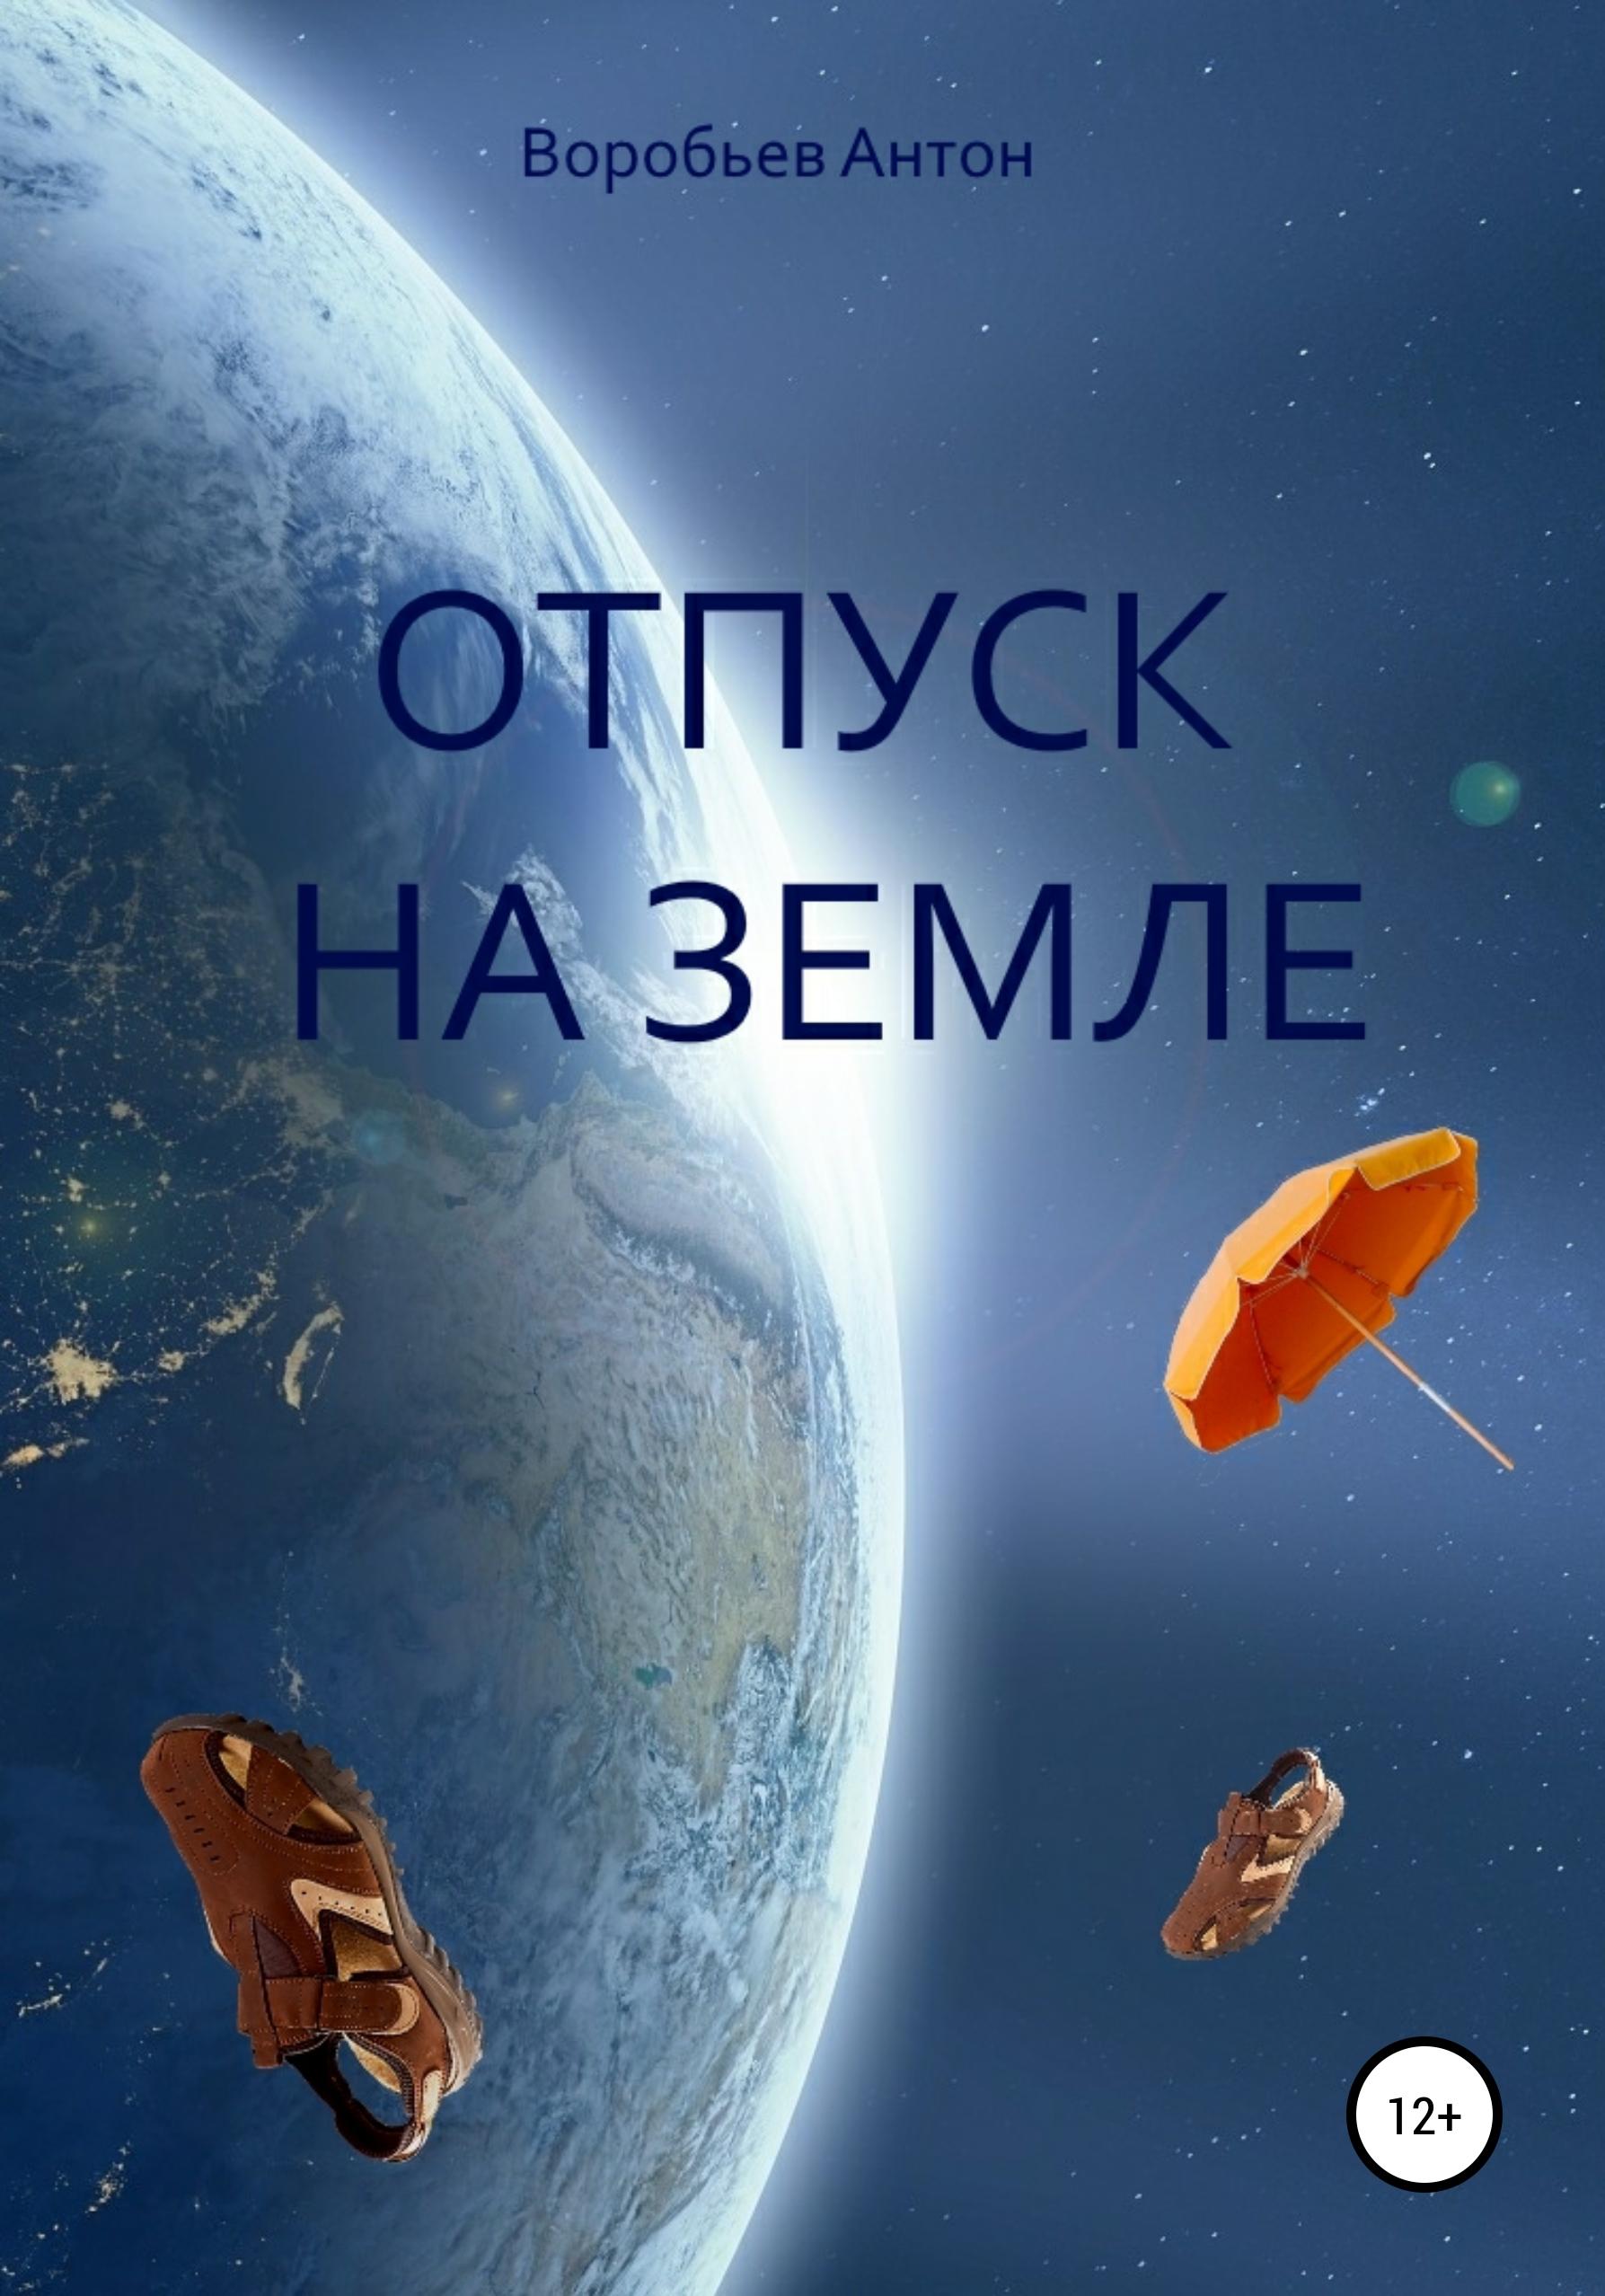 Антон Алексеевич Воробьев Отпуск на Земле антон алексеевич воробьев сны пустыни